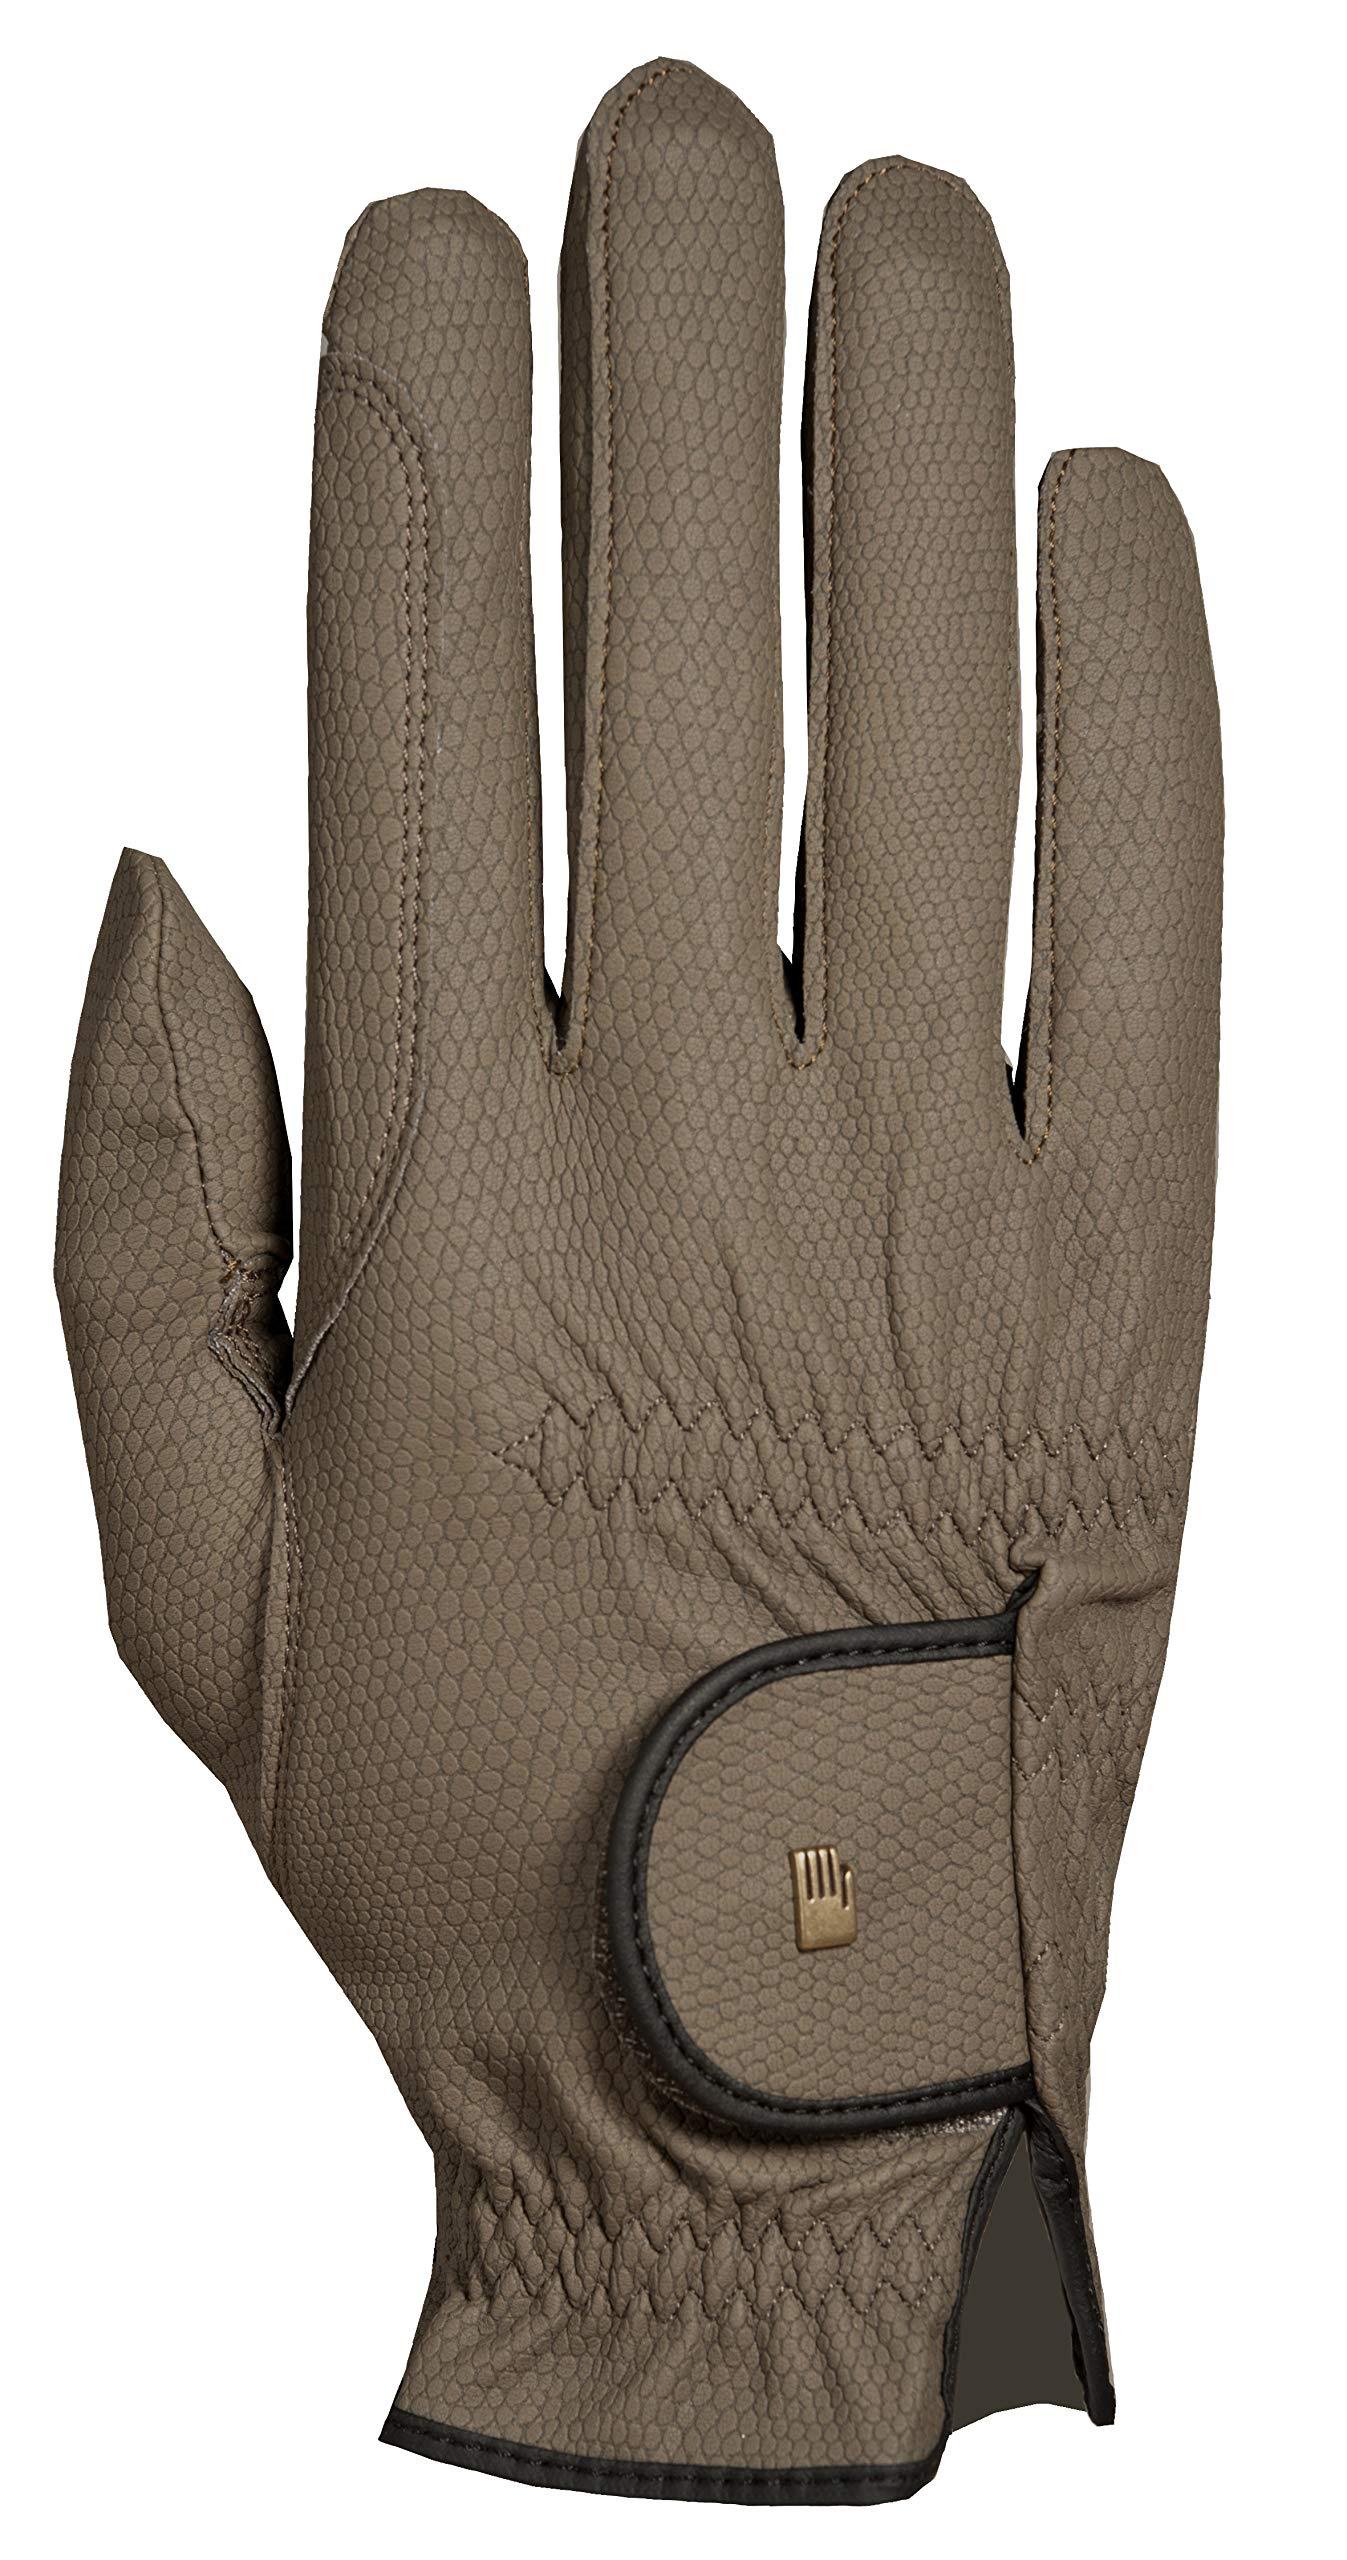 Fahrradbekleidung Handschuhe & Fäustlinge Home Full Finger dehnbar Arbeiten Handschuhe L 5Paar Weiß